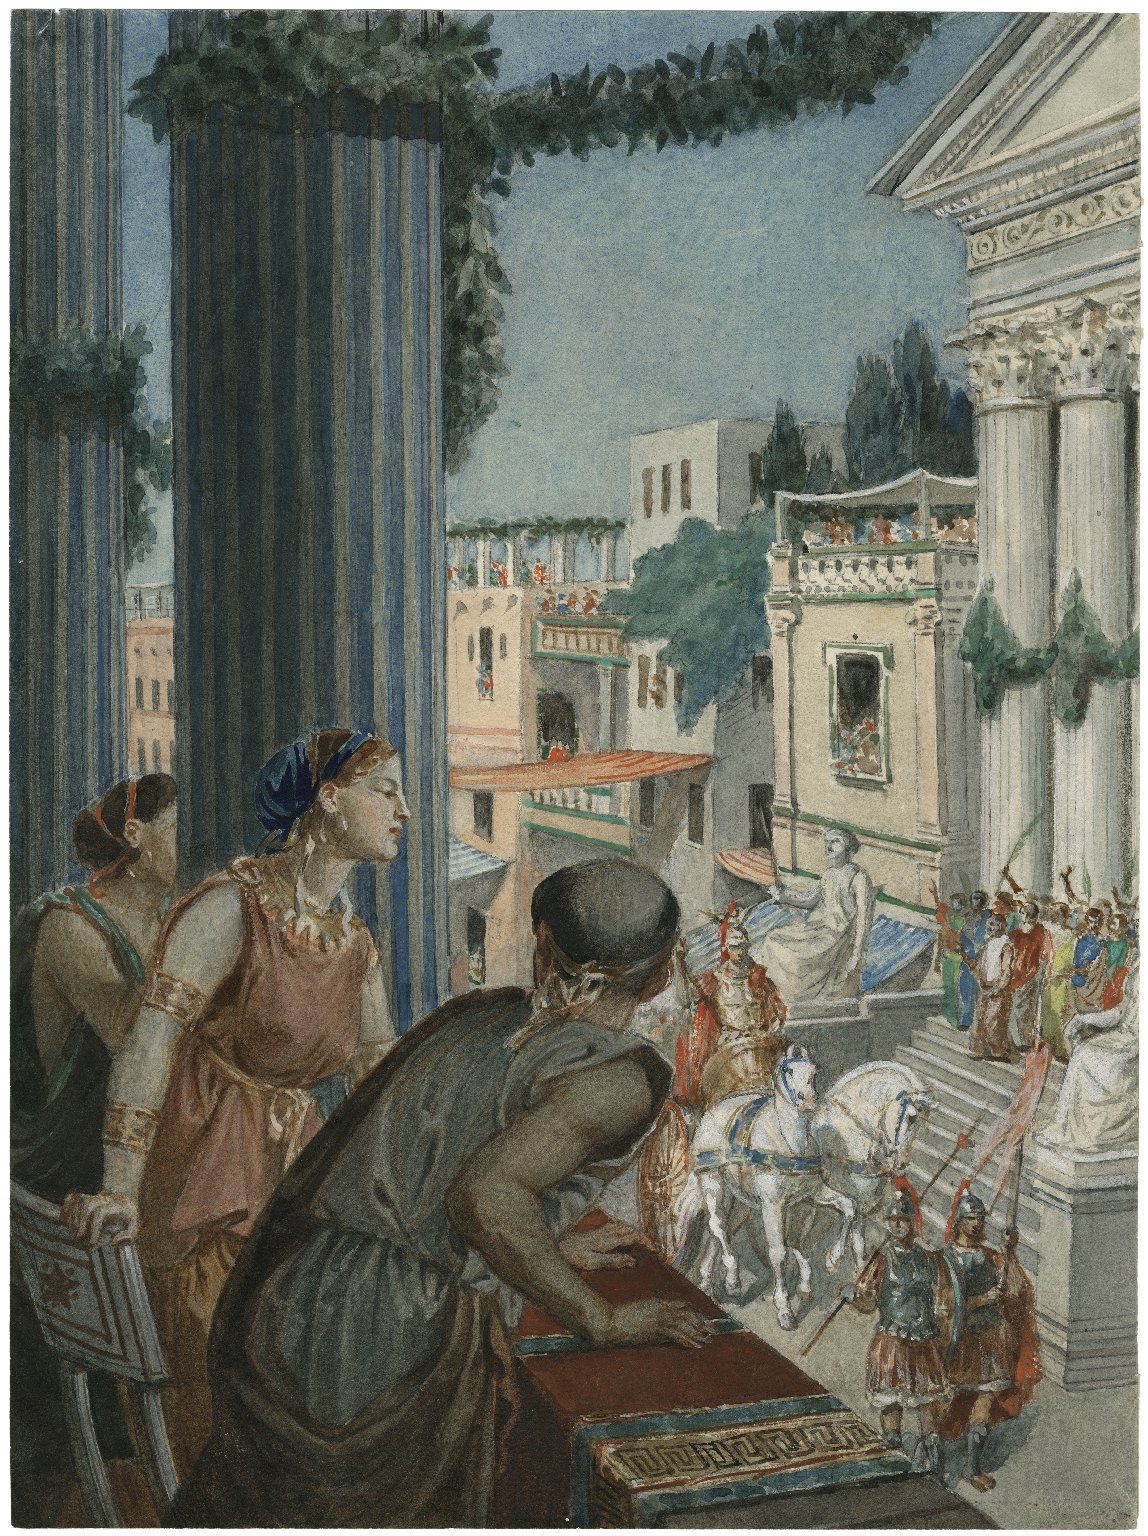 [Troilus and Cressida, I, 2, Cressida and Pandarus view passing warriors] [graphic] / [Alexandre Bida].